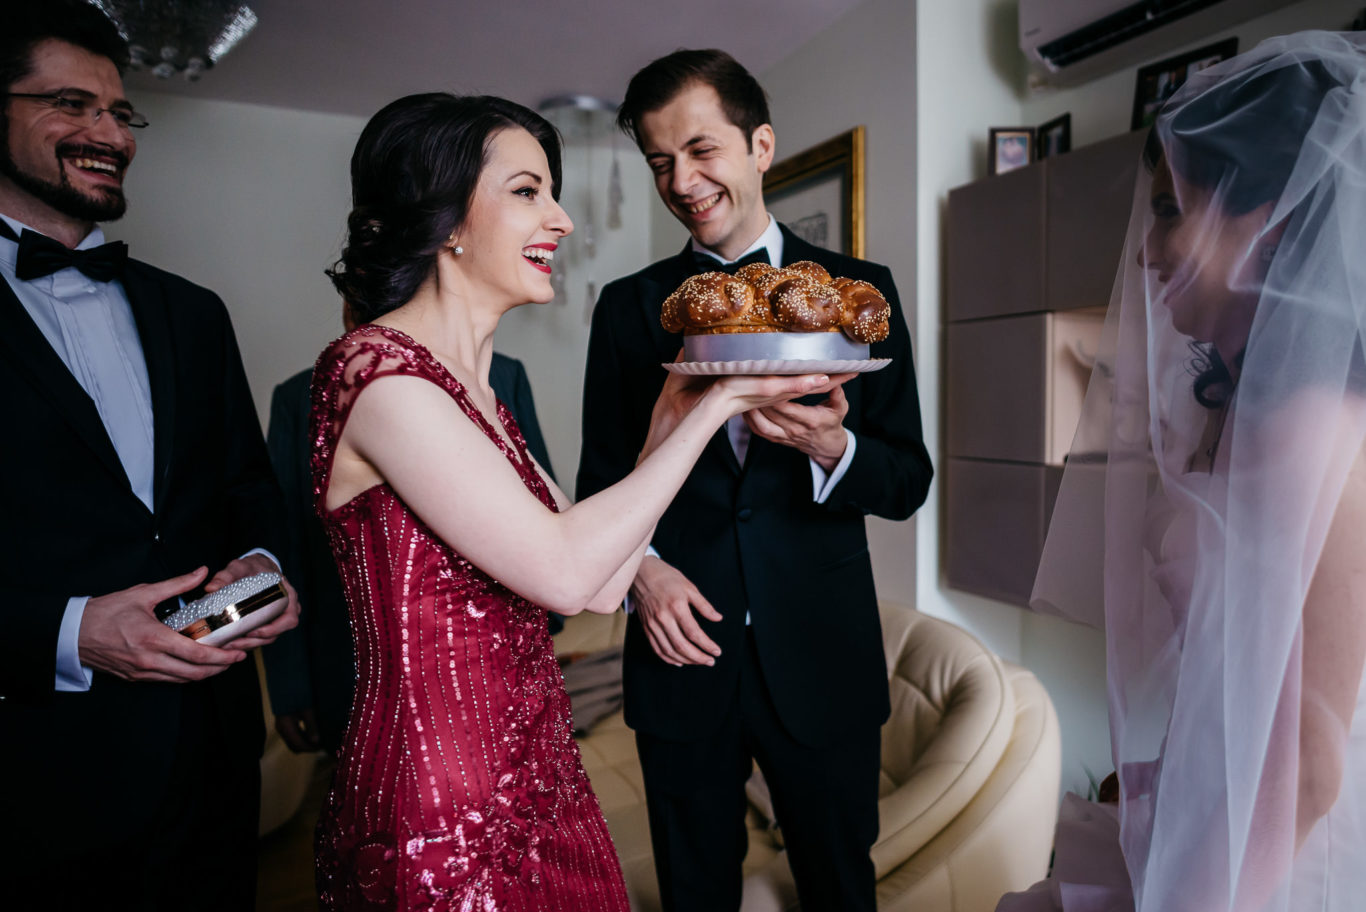 0348-Fotografie-nunta-Simona-Valentin-fotograf-Ciprian-Dumitrescu-DSC_1333